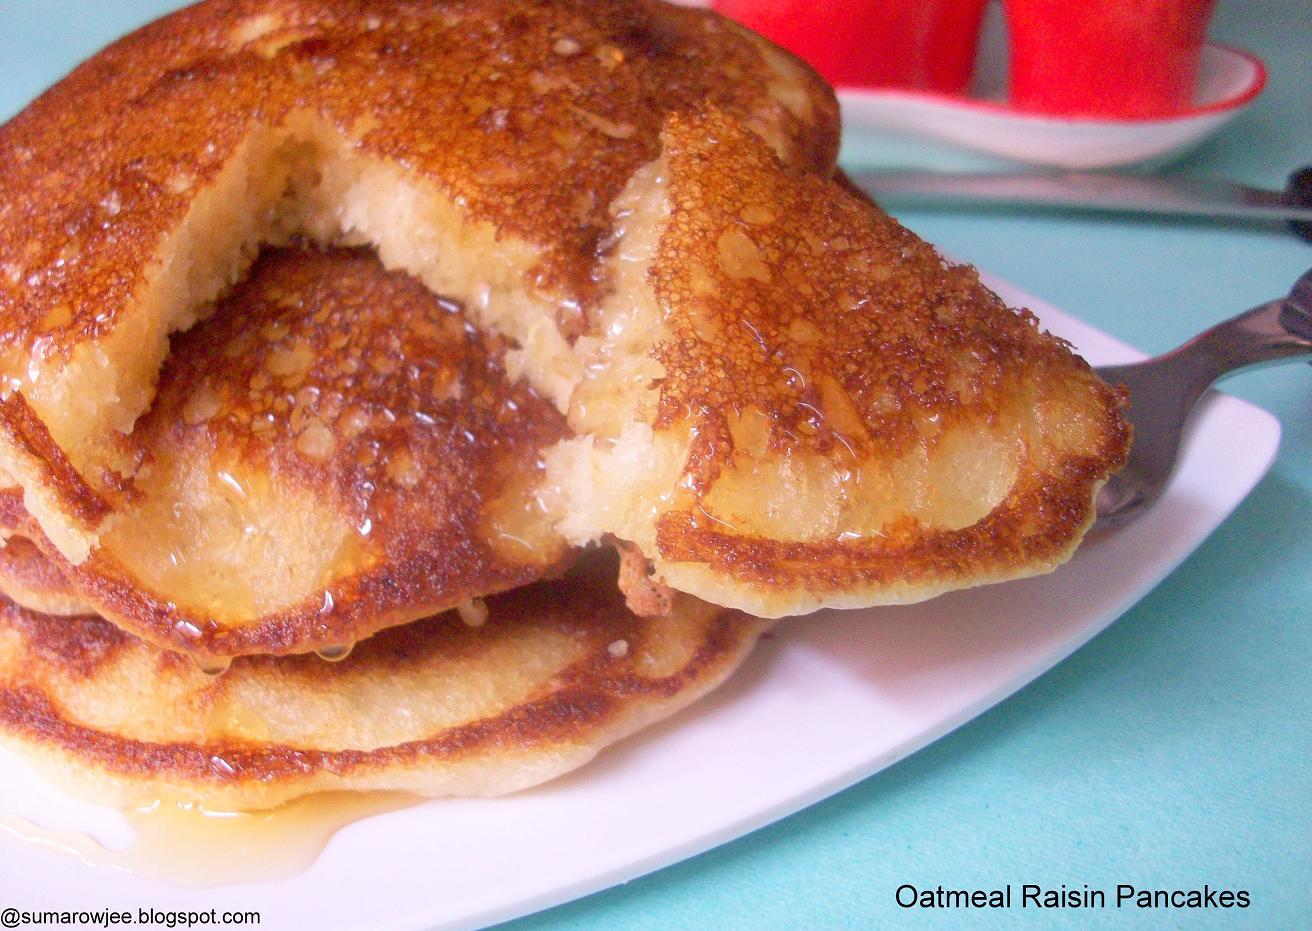 Cakes & More: Eggfree Oatmeal Raisin Pancakes